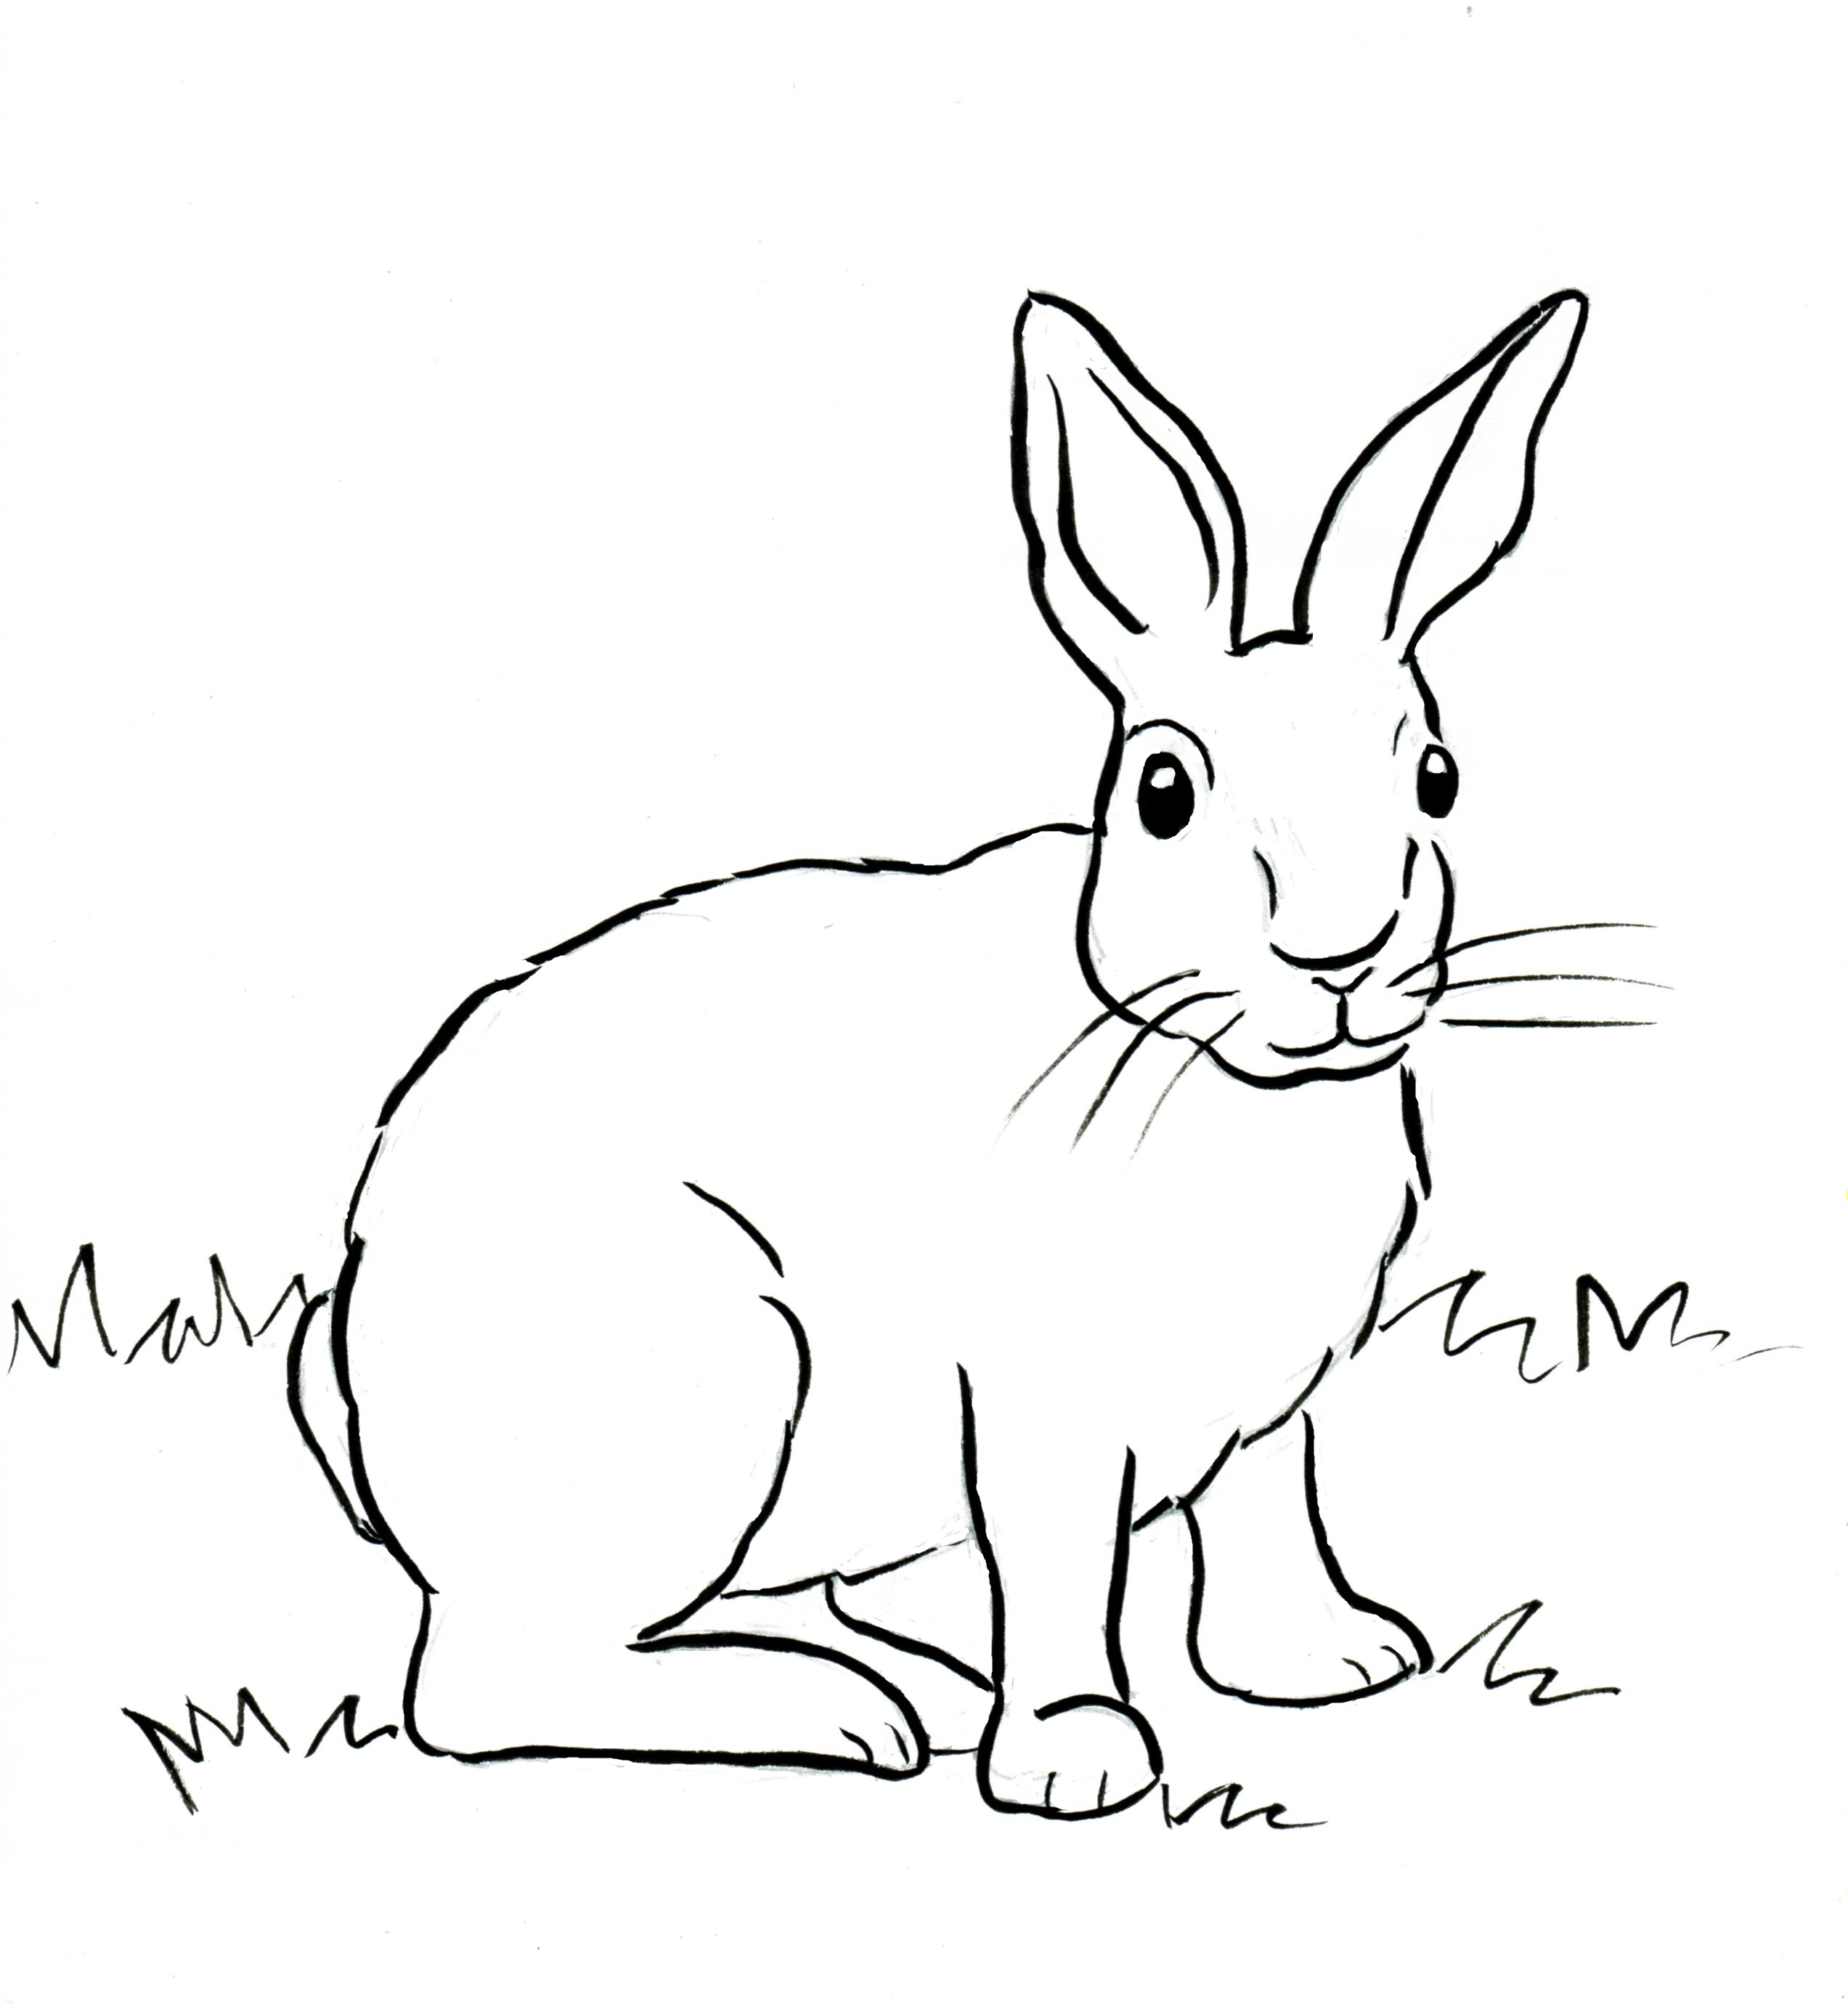 Drawn rabbit wild rabbit Rabbit Samantha Bell  Coloring